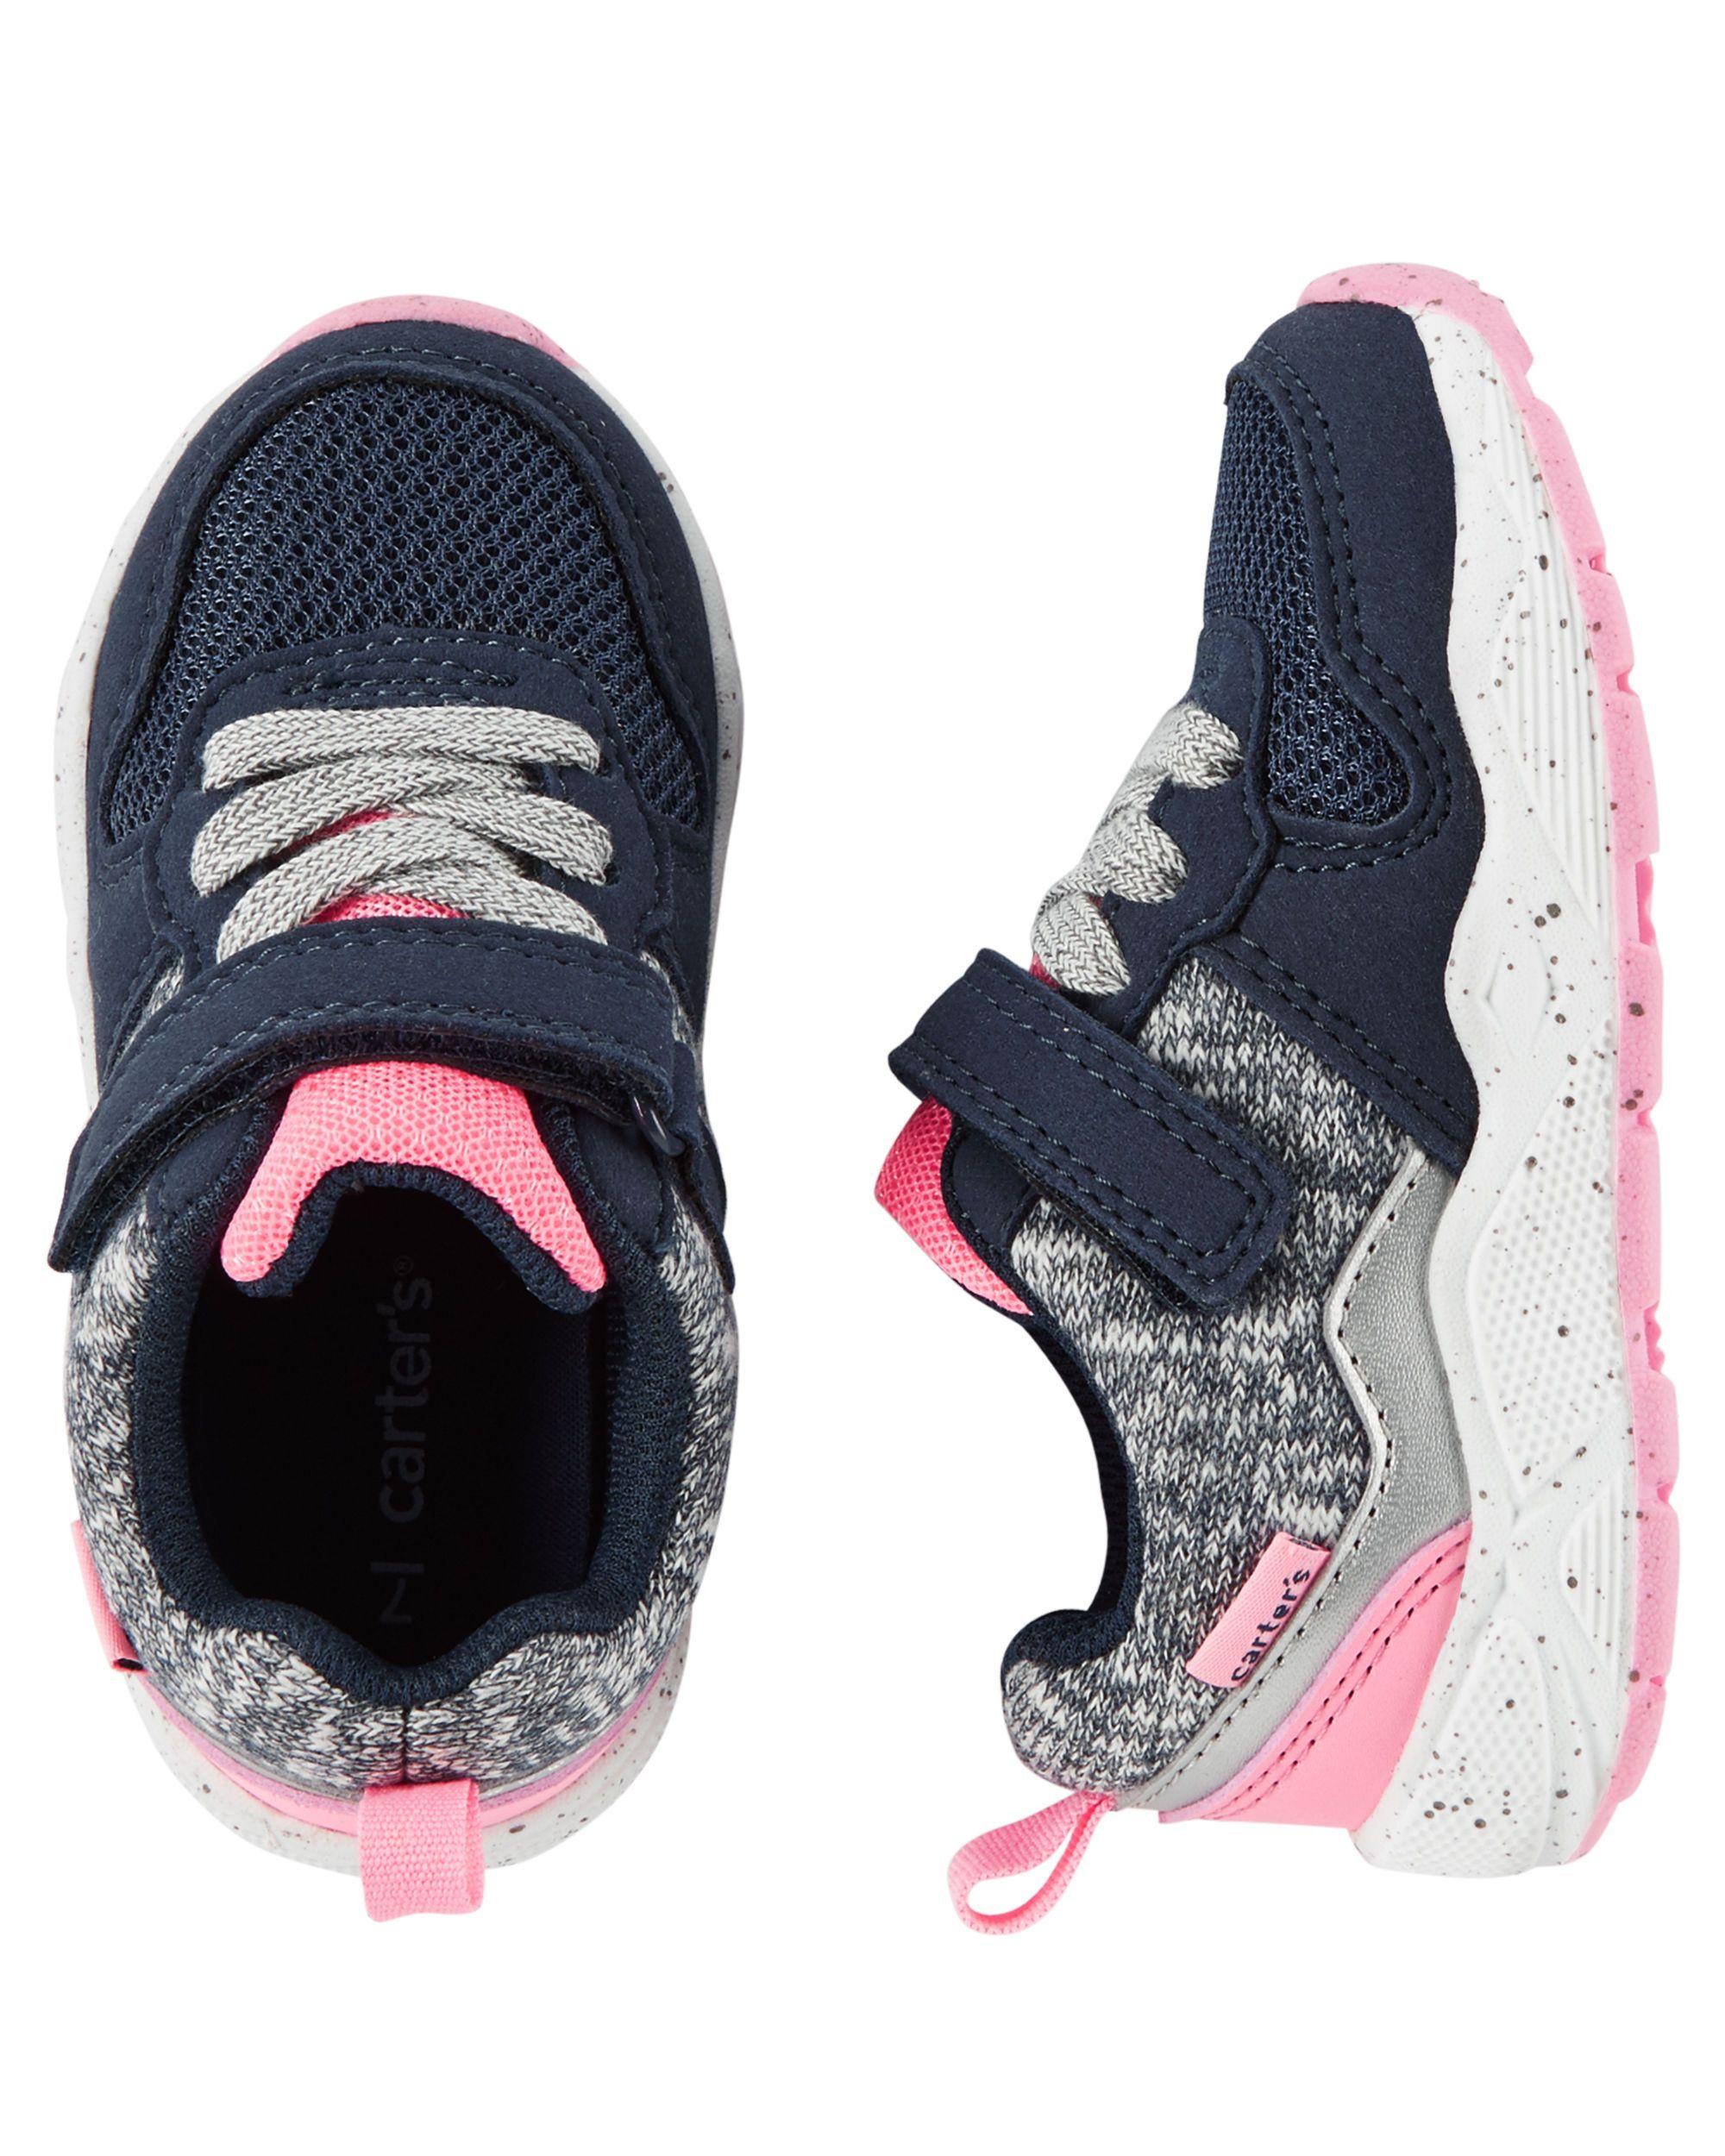 Zapatos Kids De Georgina Pin Pinterest En Bebe Stuff Torres Y wC0RPCq